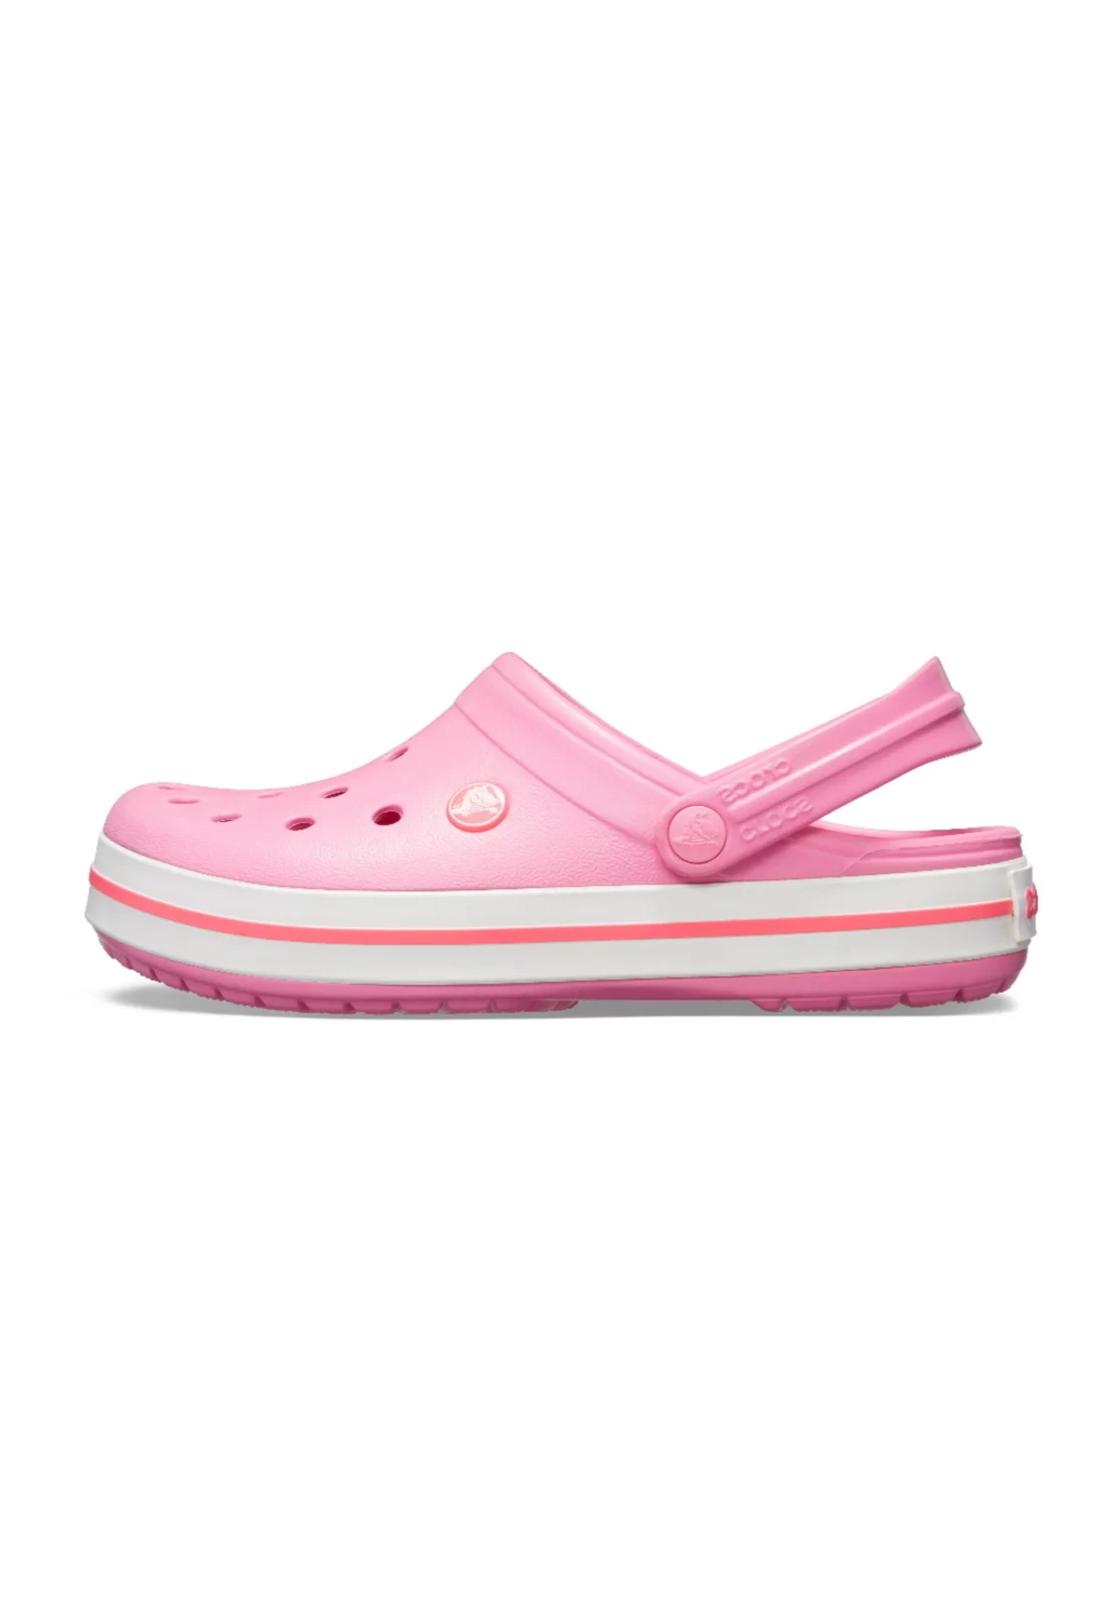 Sandália Crocs Crocband Rosa/Branco